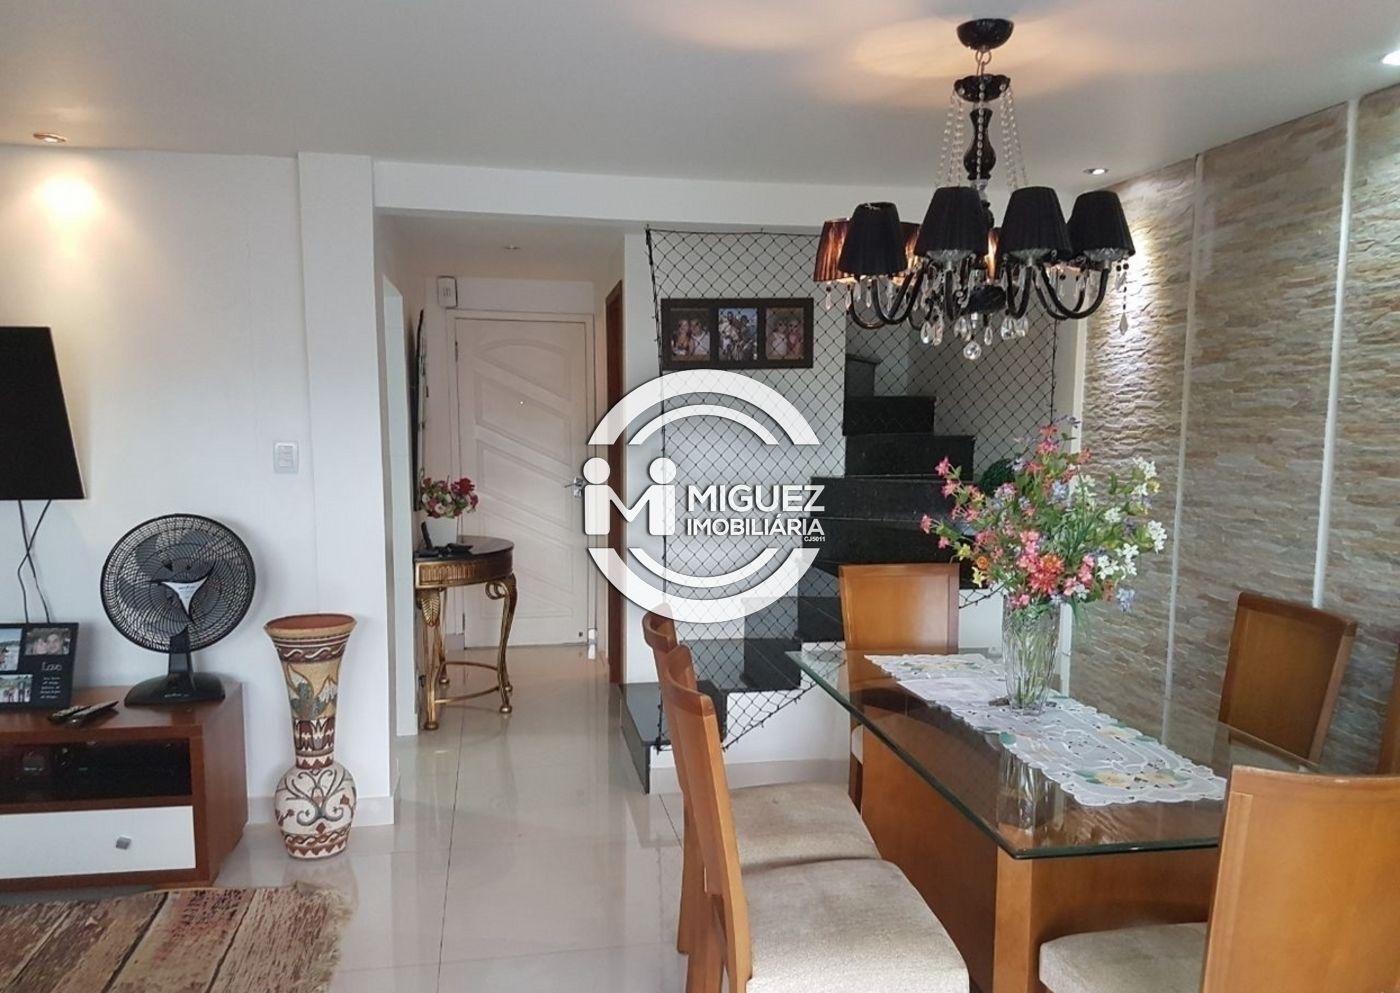 Casa, venda, Rua Professor Hélion Povoa - Tijuca , Rio de janeiro